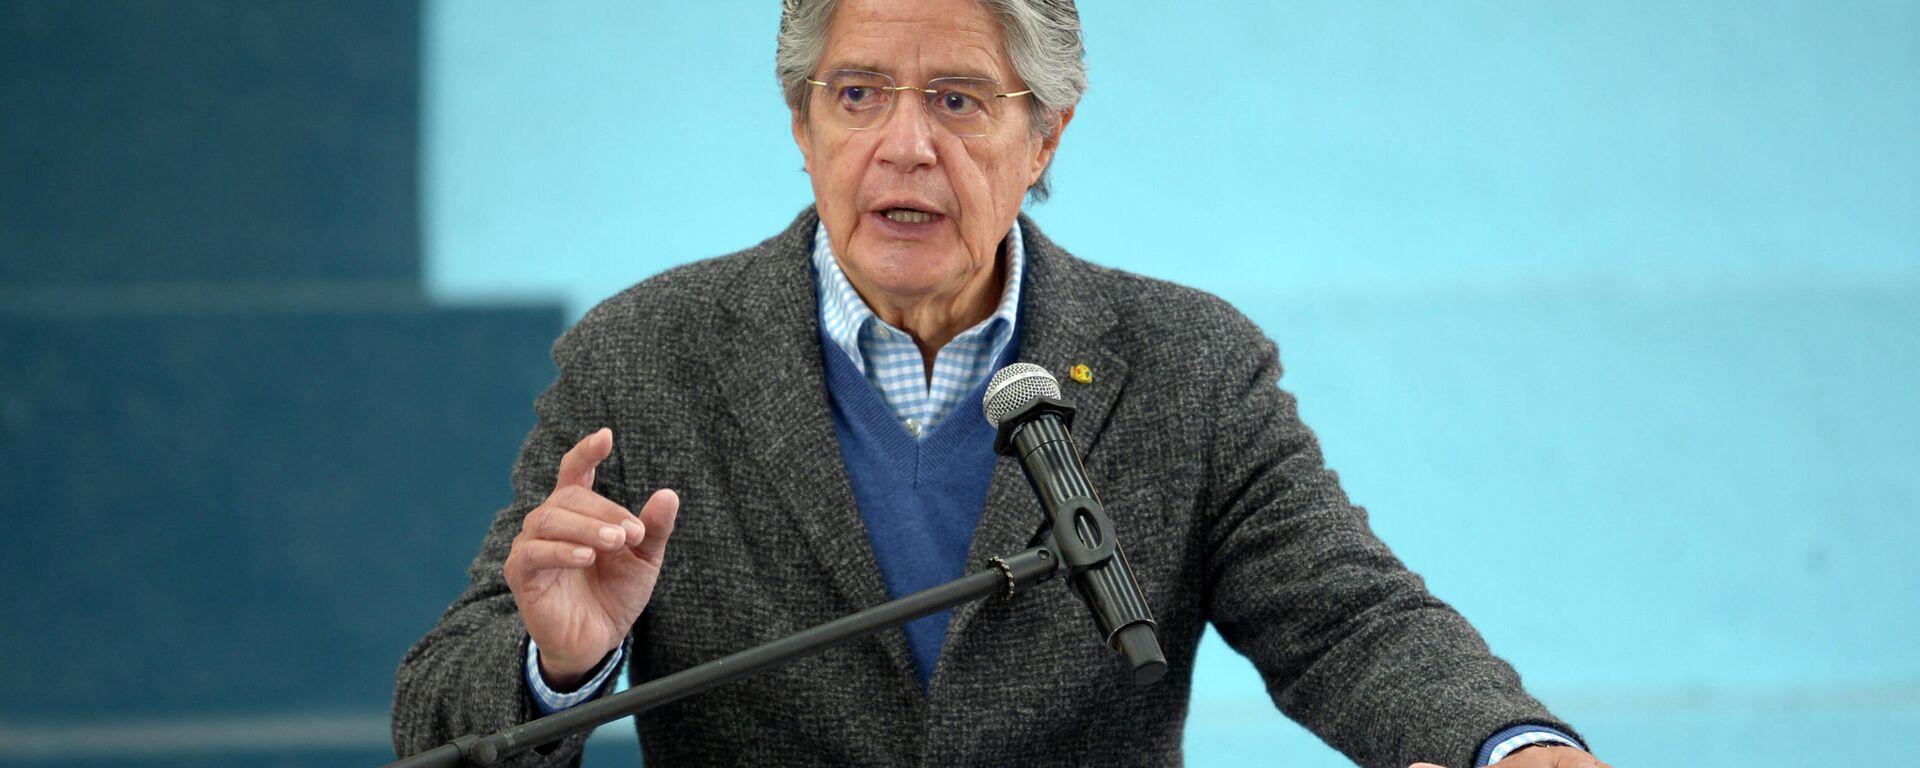 Guillermo Lasso, presidente de Ecuador - Sputnik Mundo, 1920, 02.09.2021